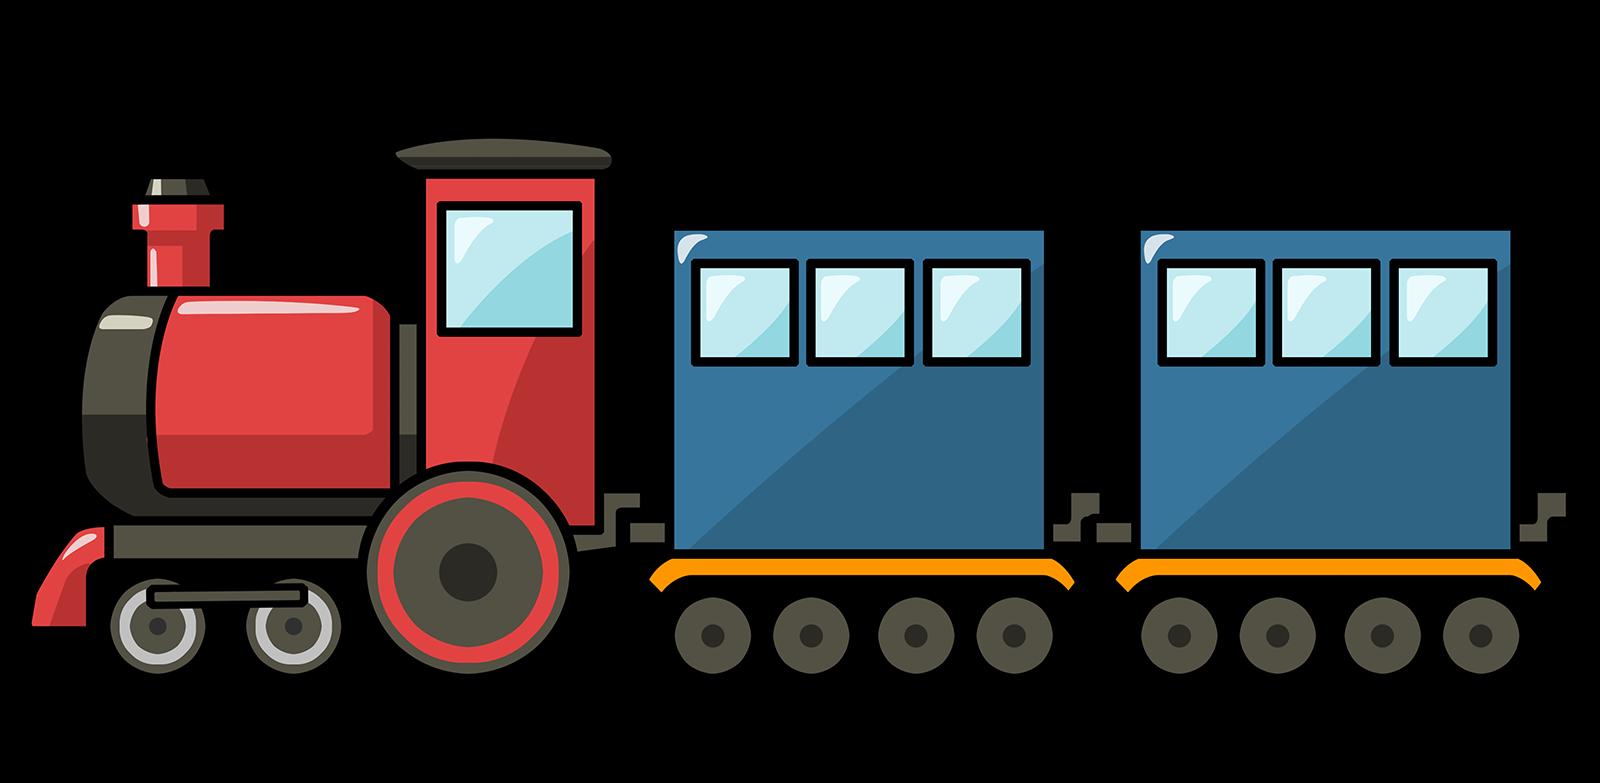 1600x783 Train Clipart Amp Train Clip Art Images